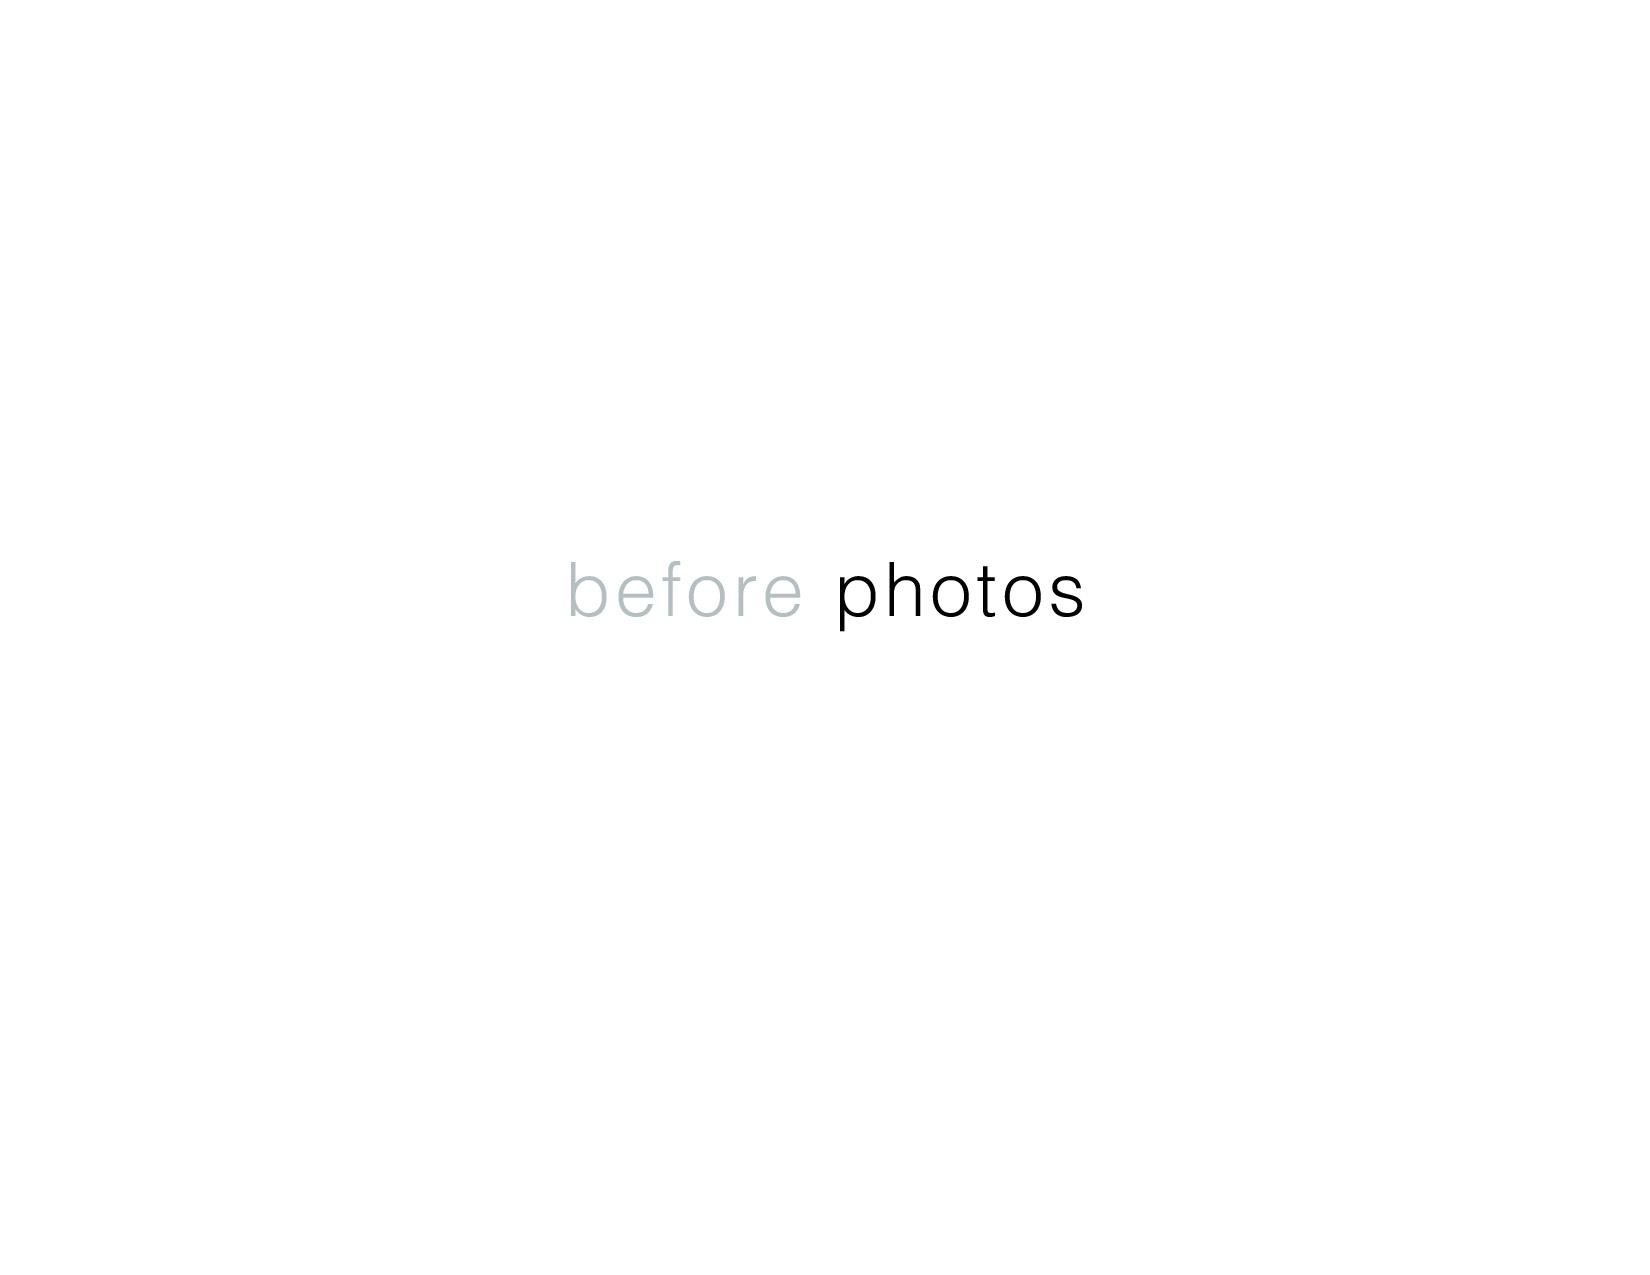 Before Photos Label.jpg